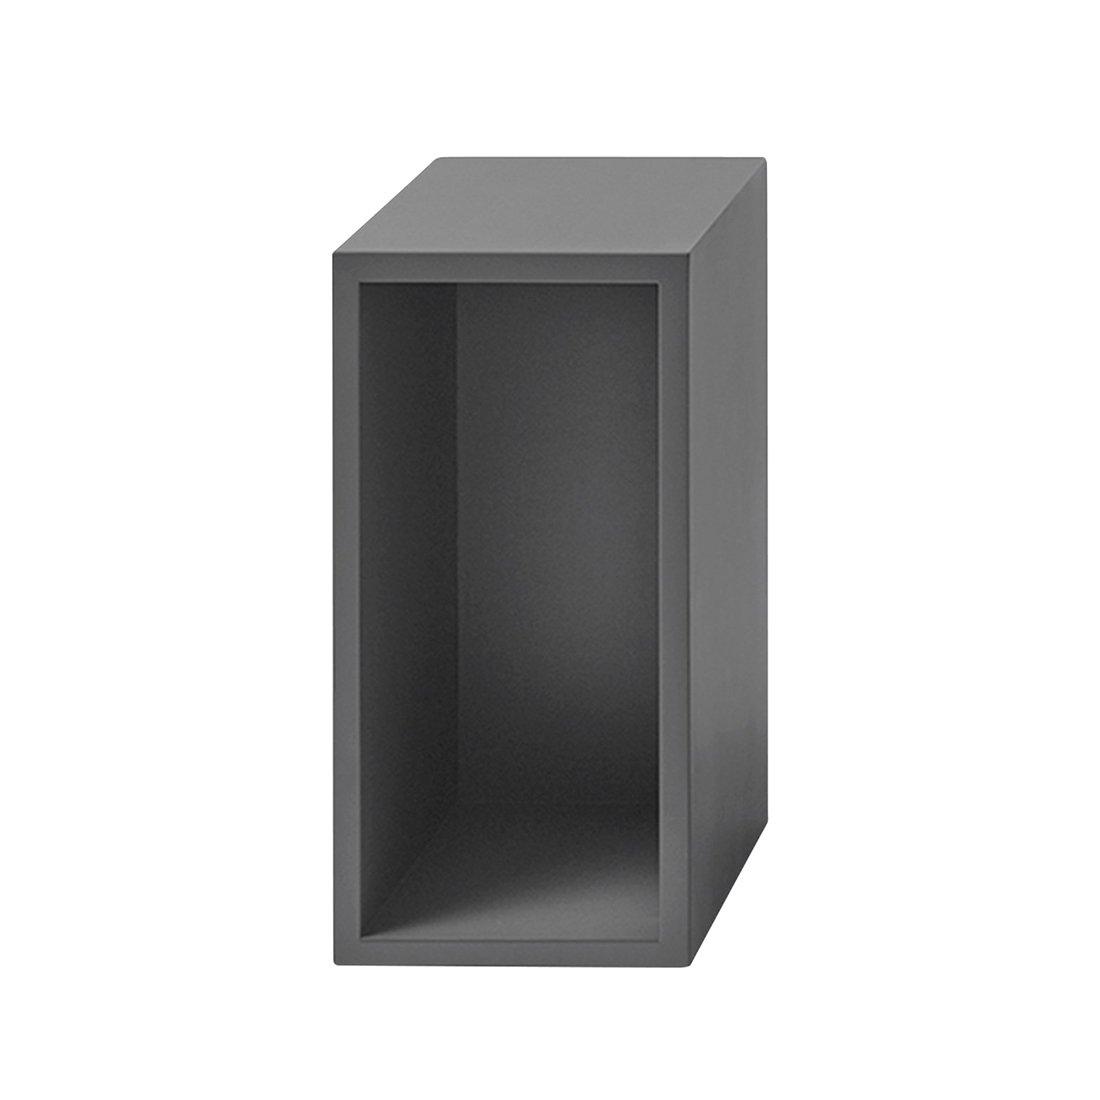 Muuto Stacked 2.0 Modules Small Grijs/Dicht